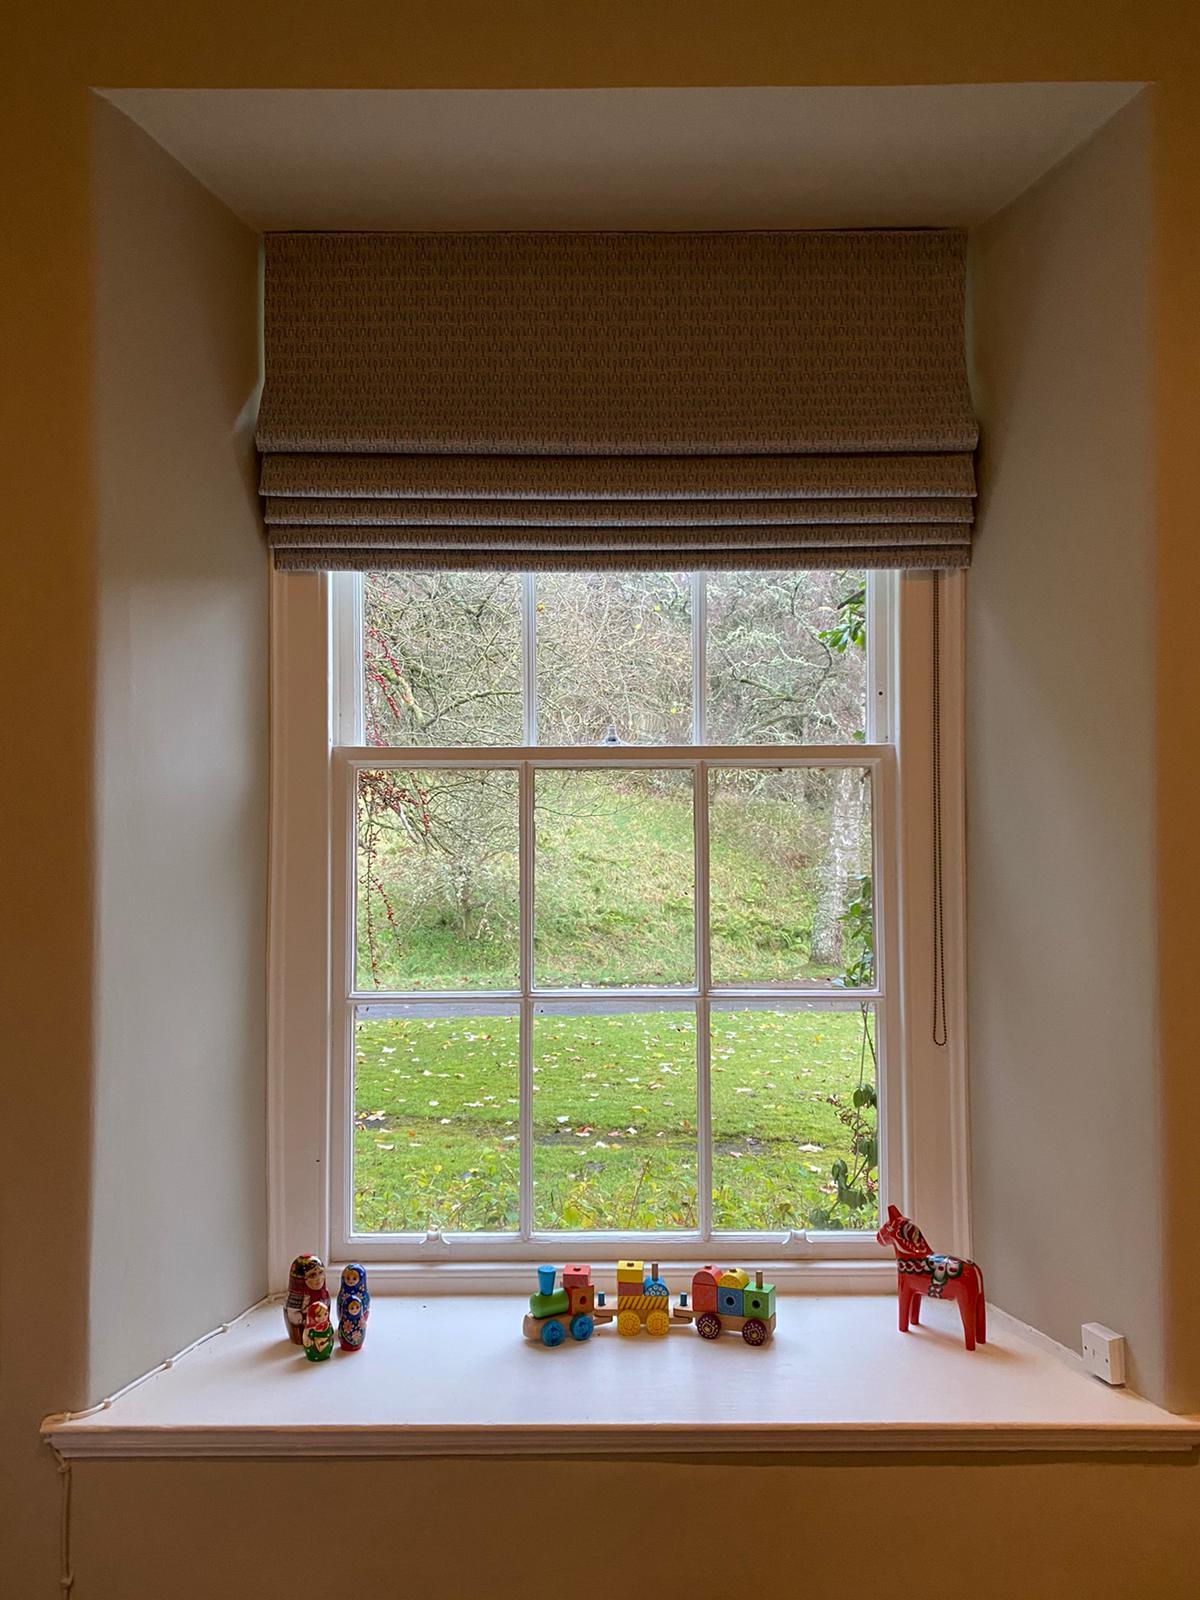 Playroom blinds